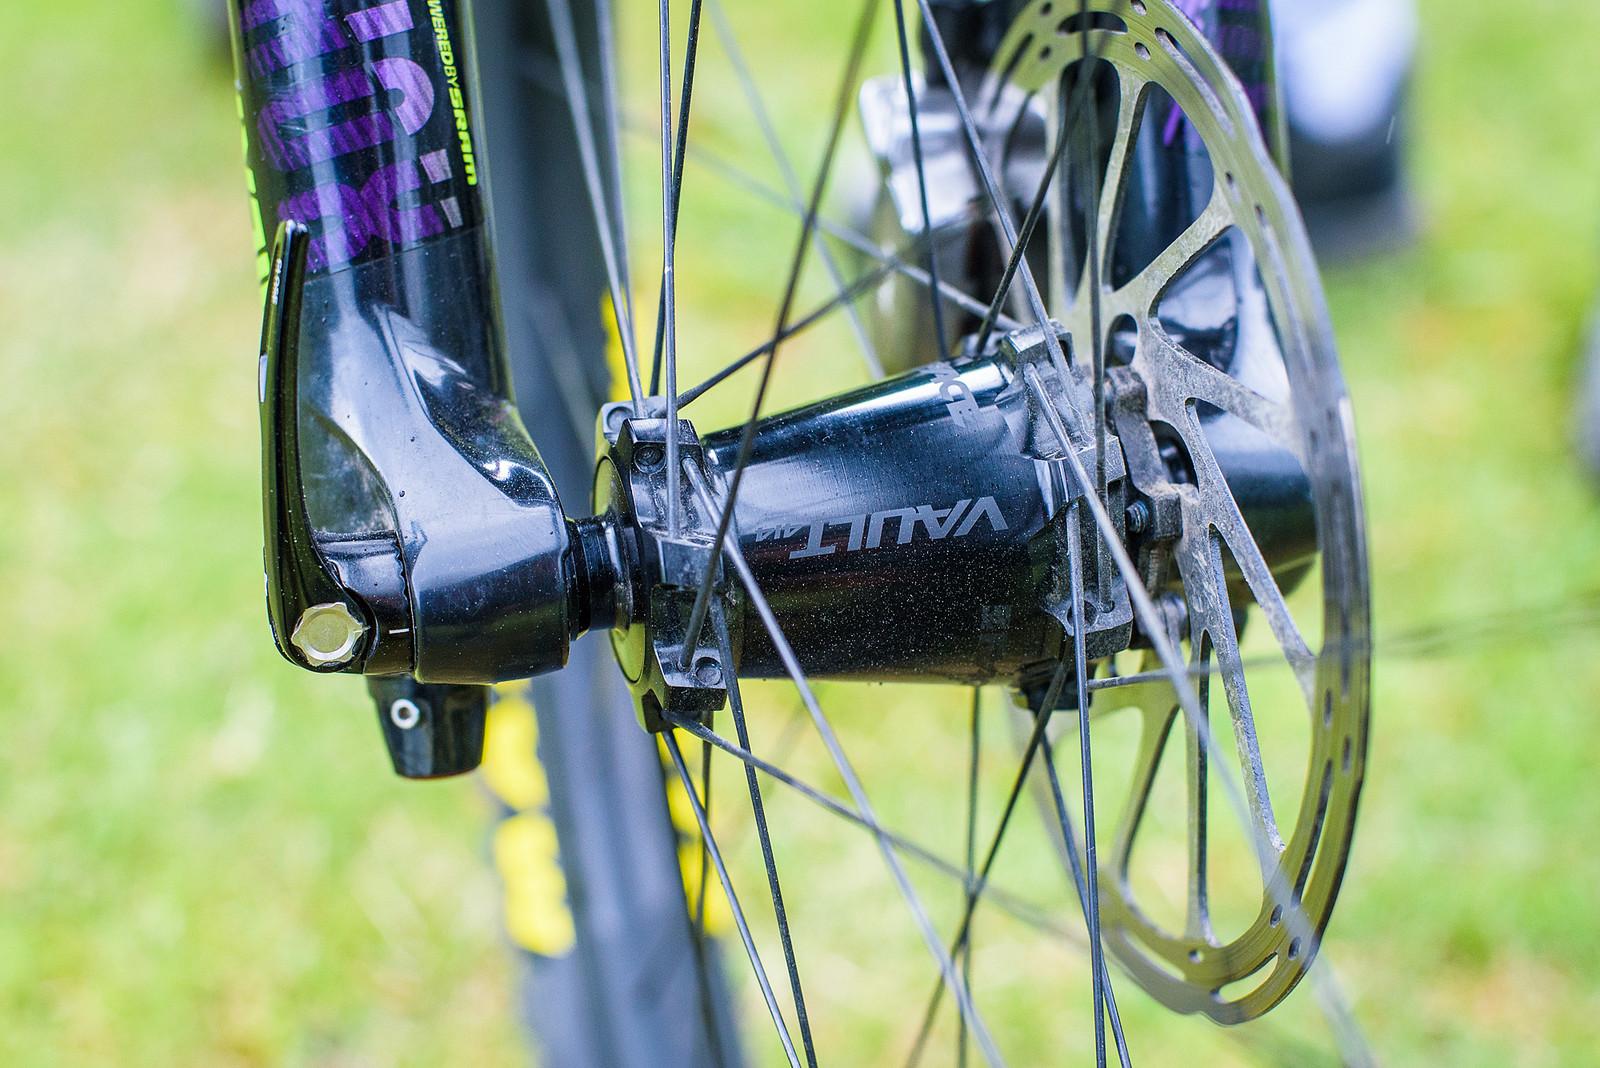 Race Face Turbine R Wheels - Pro Bike Check: Keegan Wright's Devinci Spartan Carbon - Mountain Biking Pictures - Vital MTB